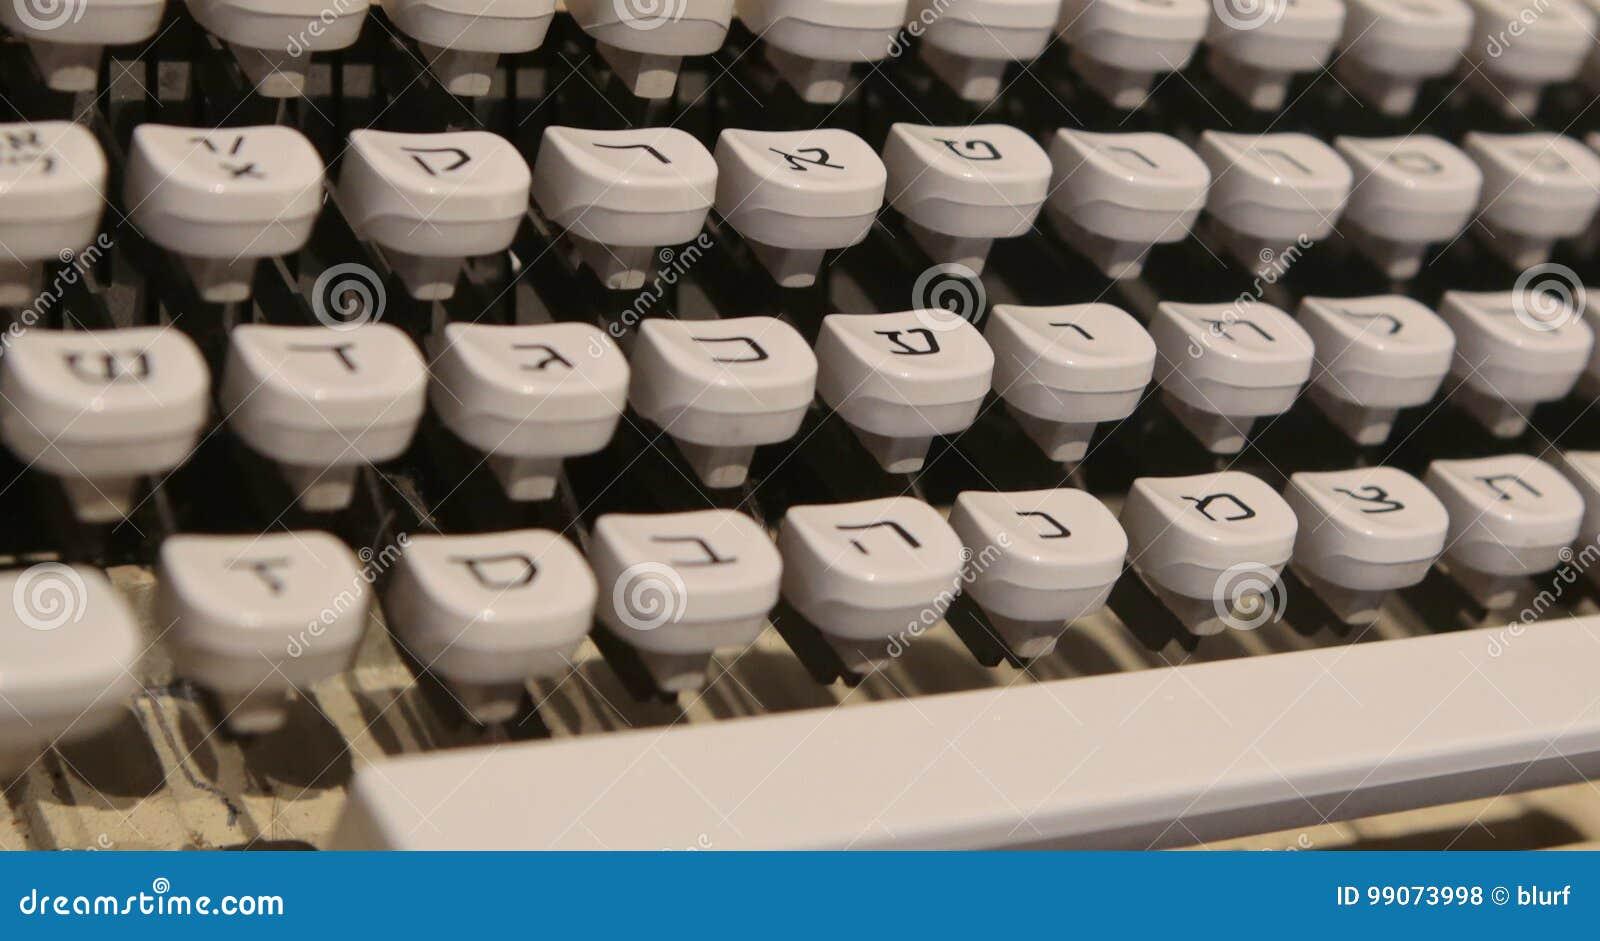 Antique hebrew typewriter keys